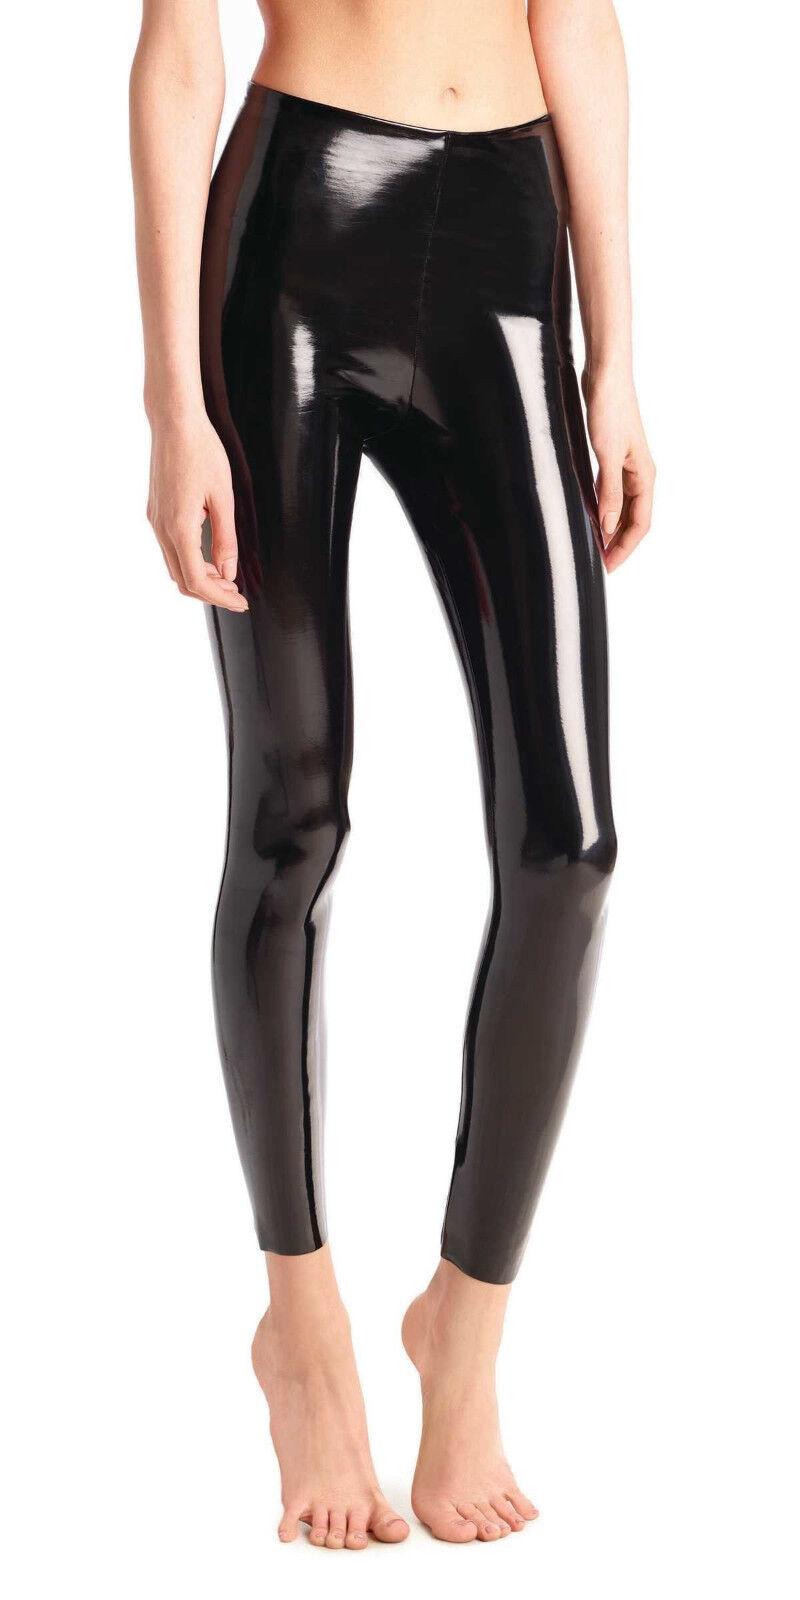 bd8cfa9cd2db7 Commando Faux Patent Leather Legging with Perfect Control - SLG25 | eBay